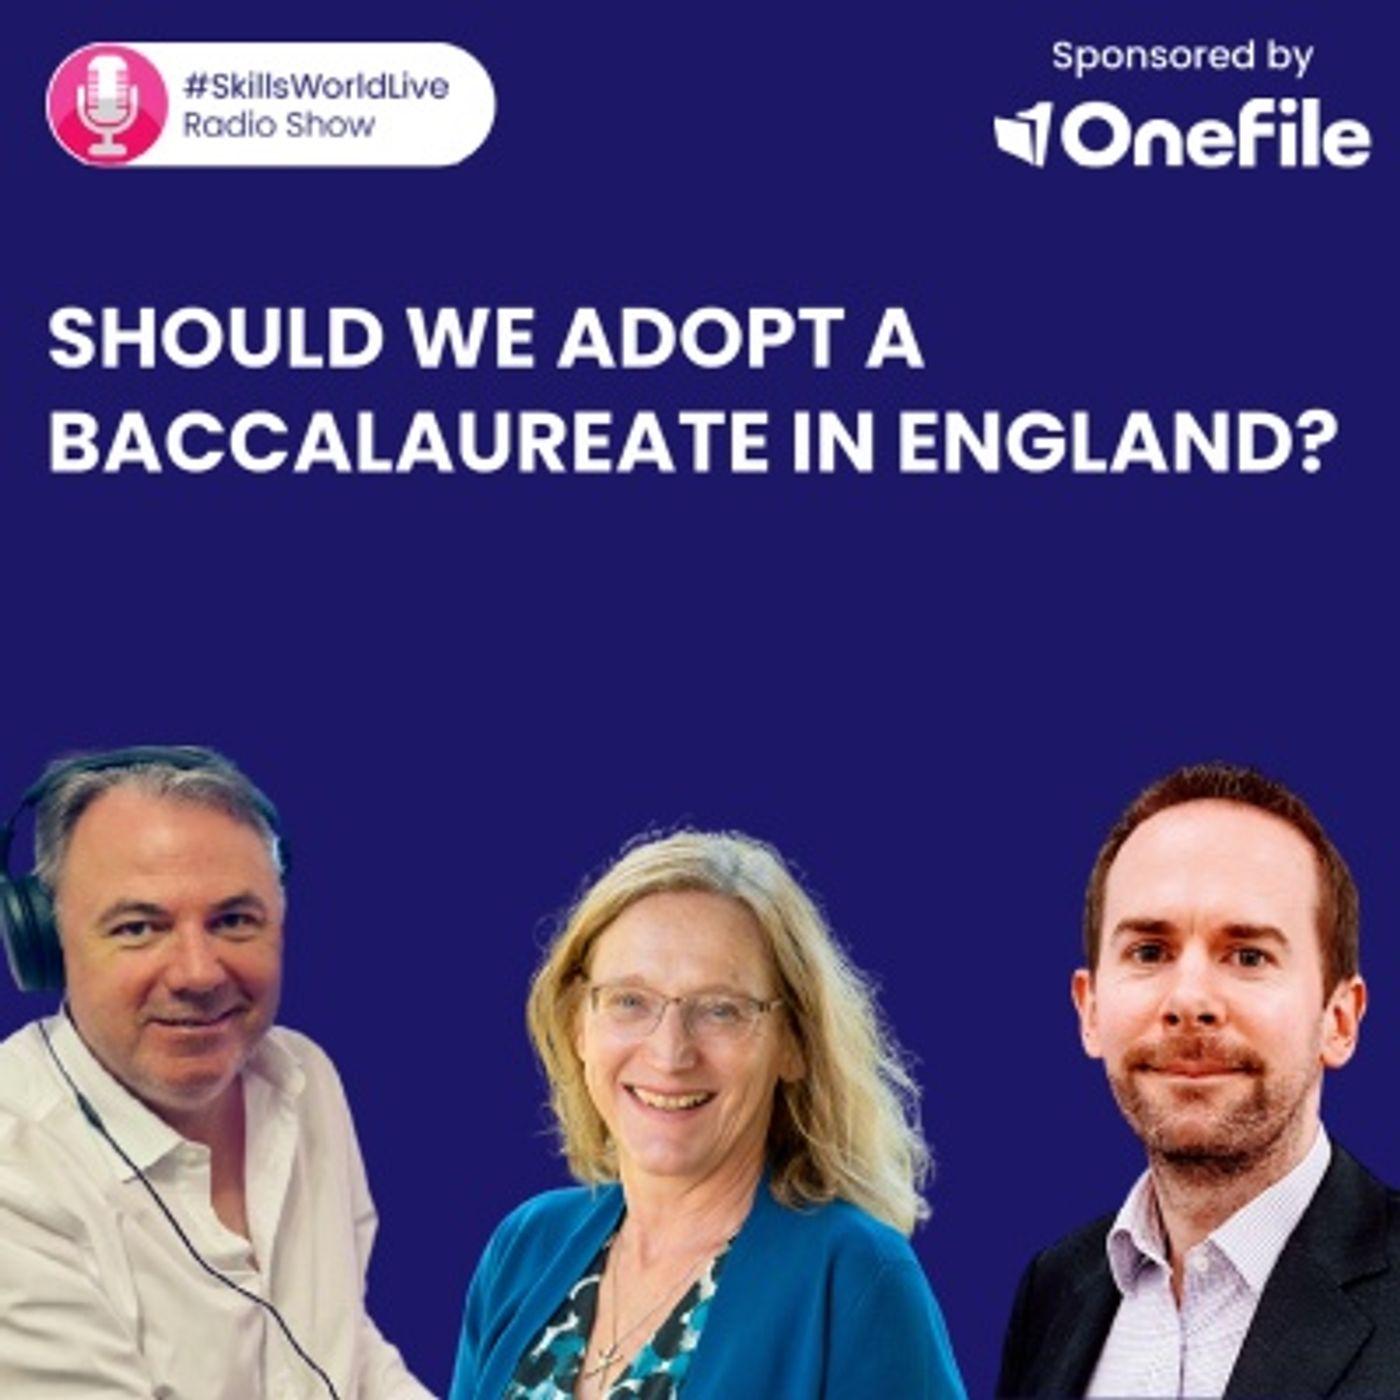 Should we adopt a Baccalaureate in England? #SkillsWorldLive 3.6